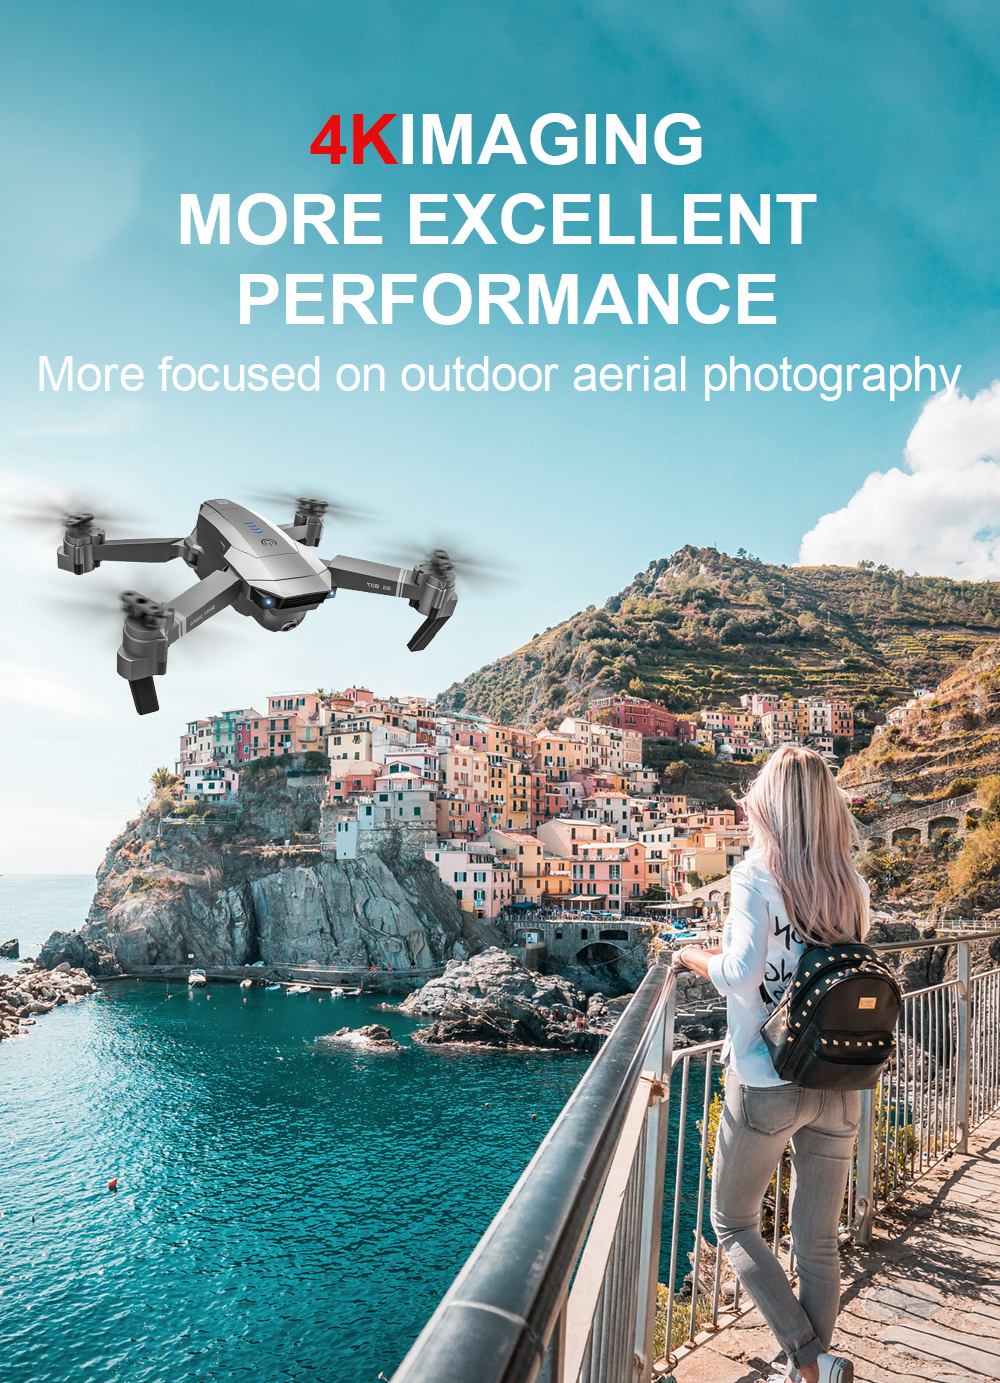 SG907 4K 1080P Video Gimbal Full HD Dual Kamera RC Drone FPV GPS 5G WIFI Quadcopter Folgen mich Professionelle Weitwinkel Anti Schütteln - 5